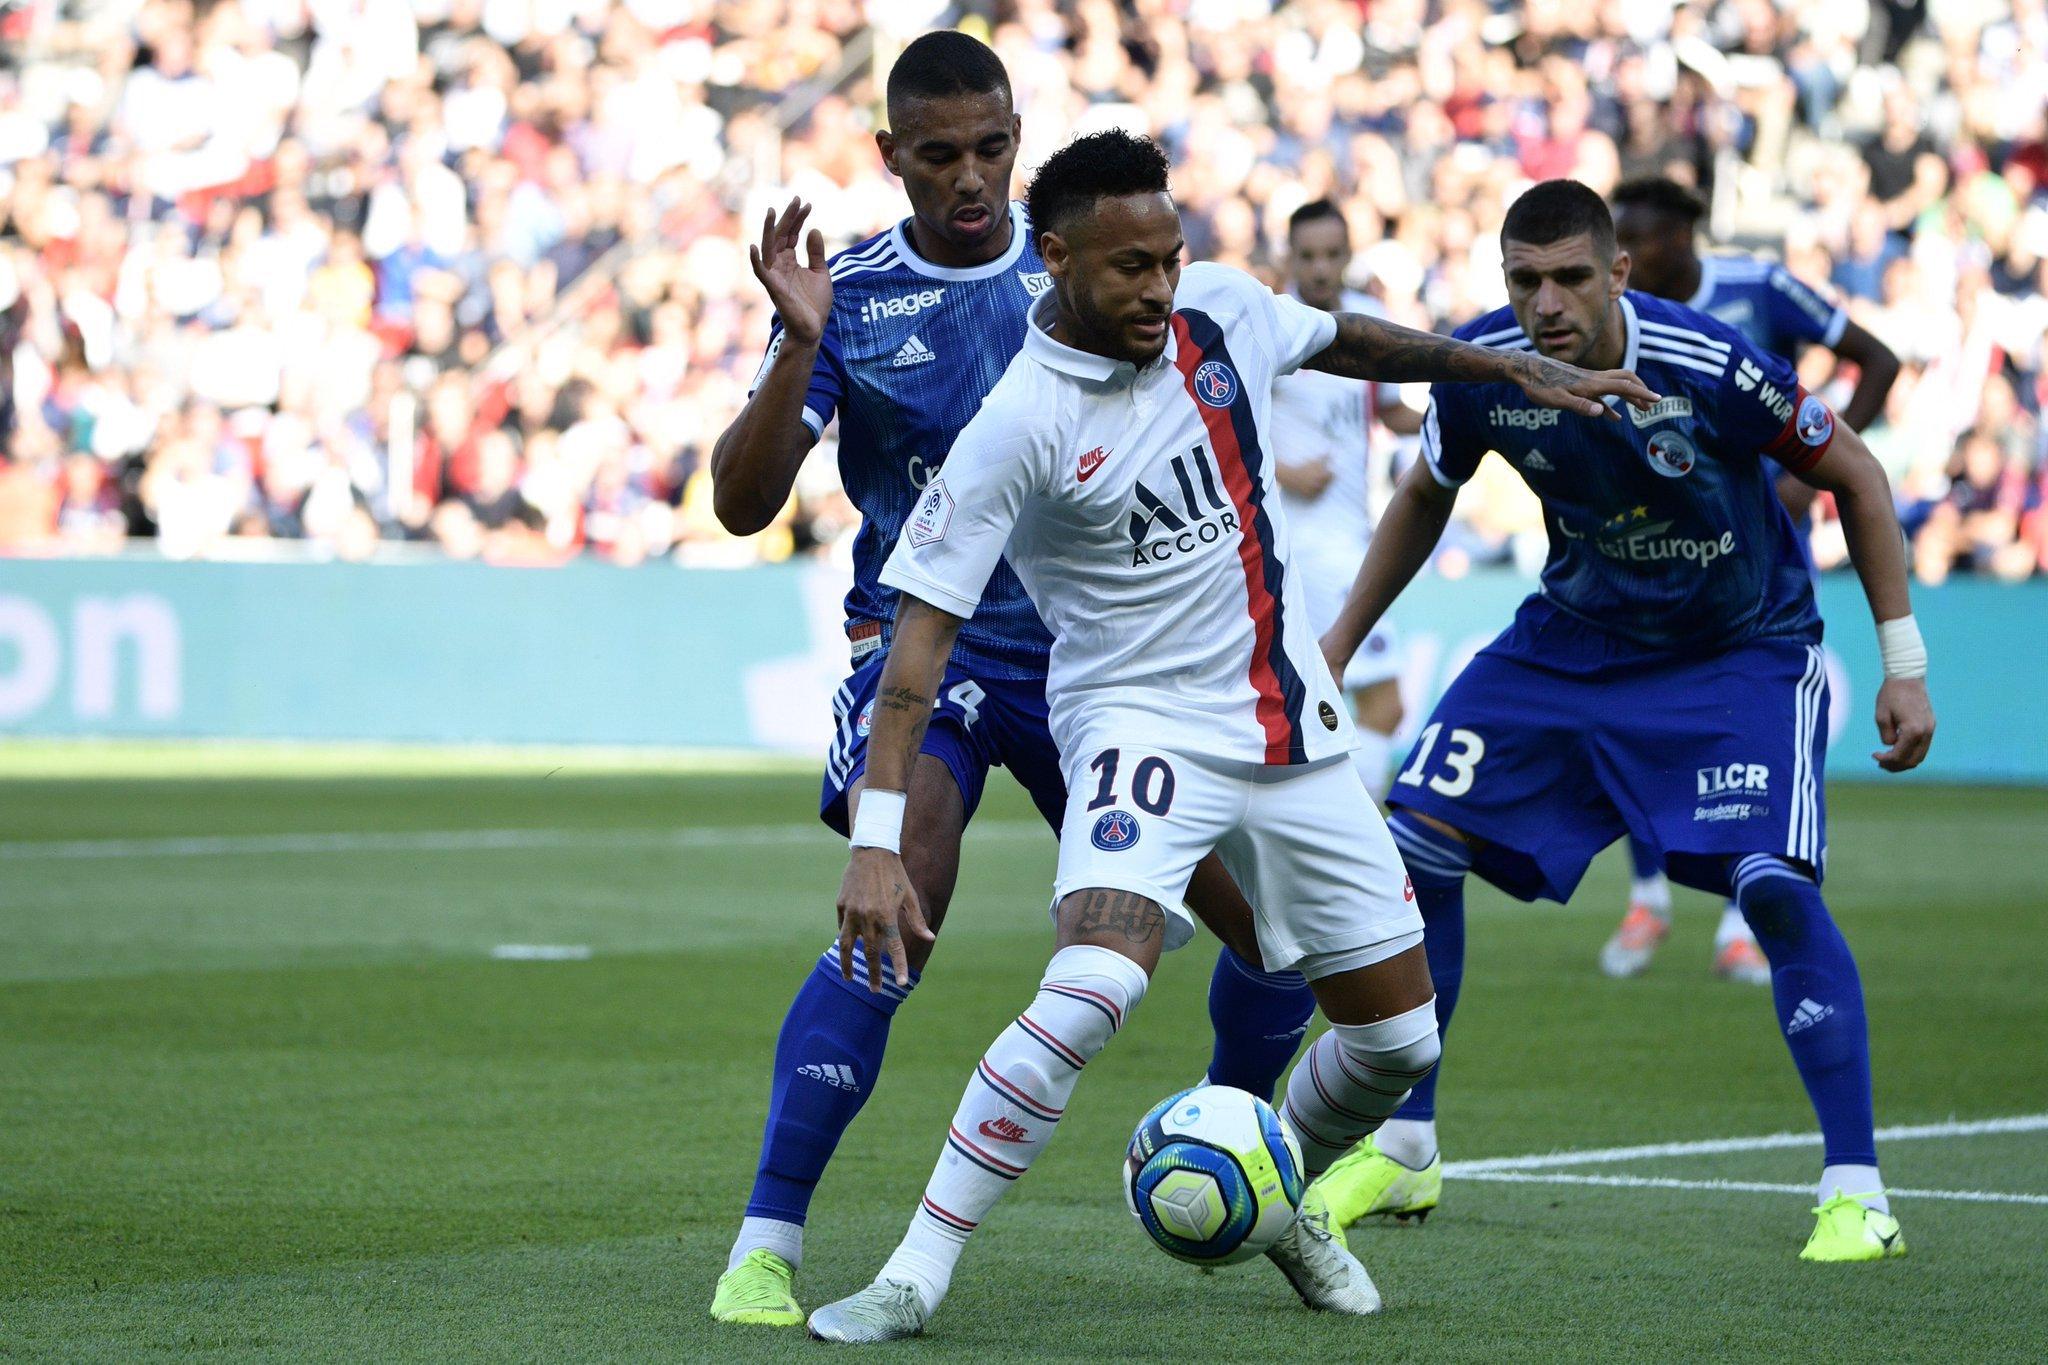 Soi kèo PSG vs Strasbourg, 02h00 ngày 15/08 – Ligue 1